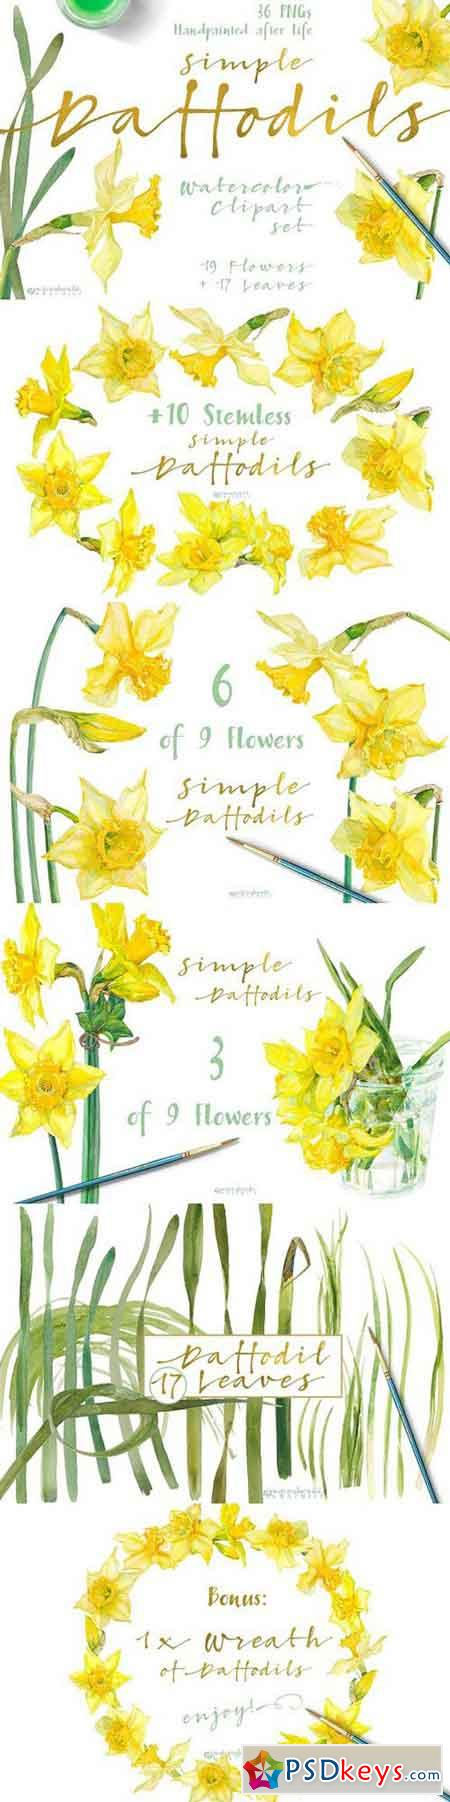 Simple Daffodils 1343602